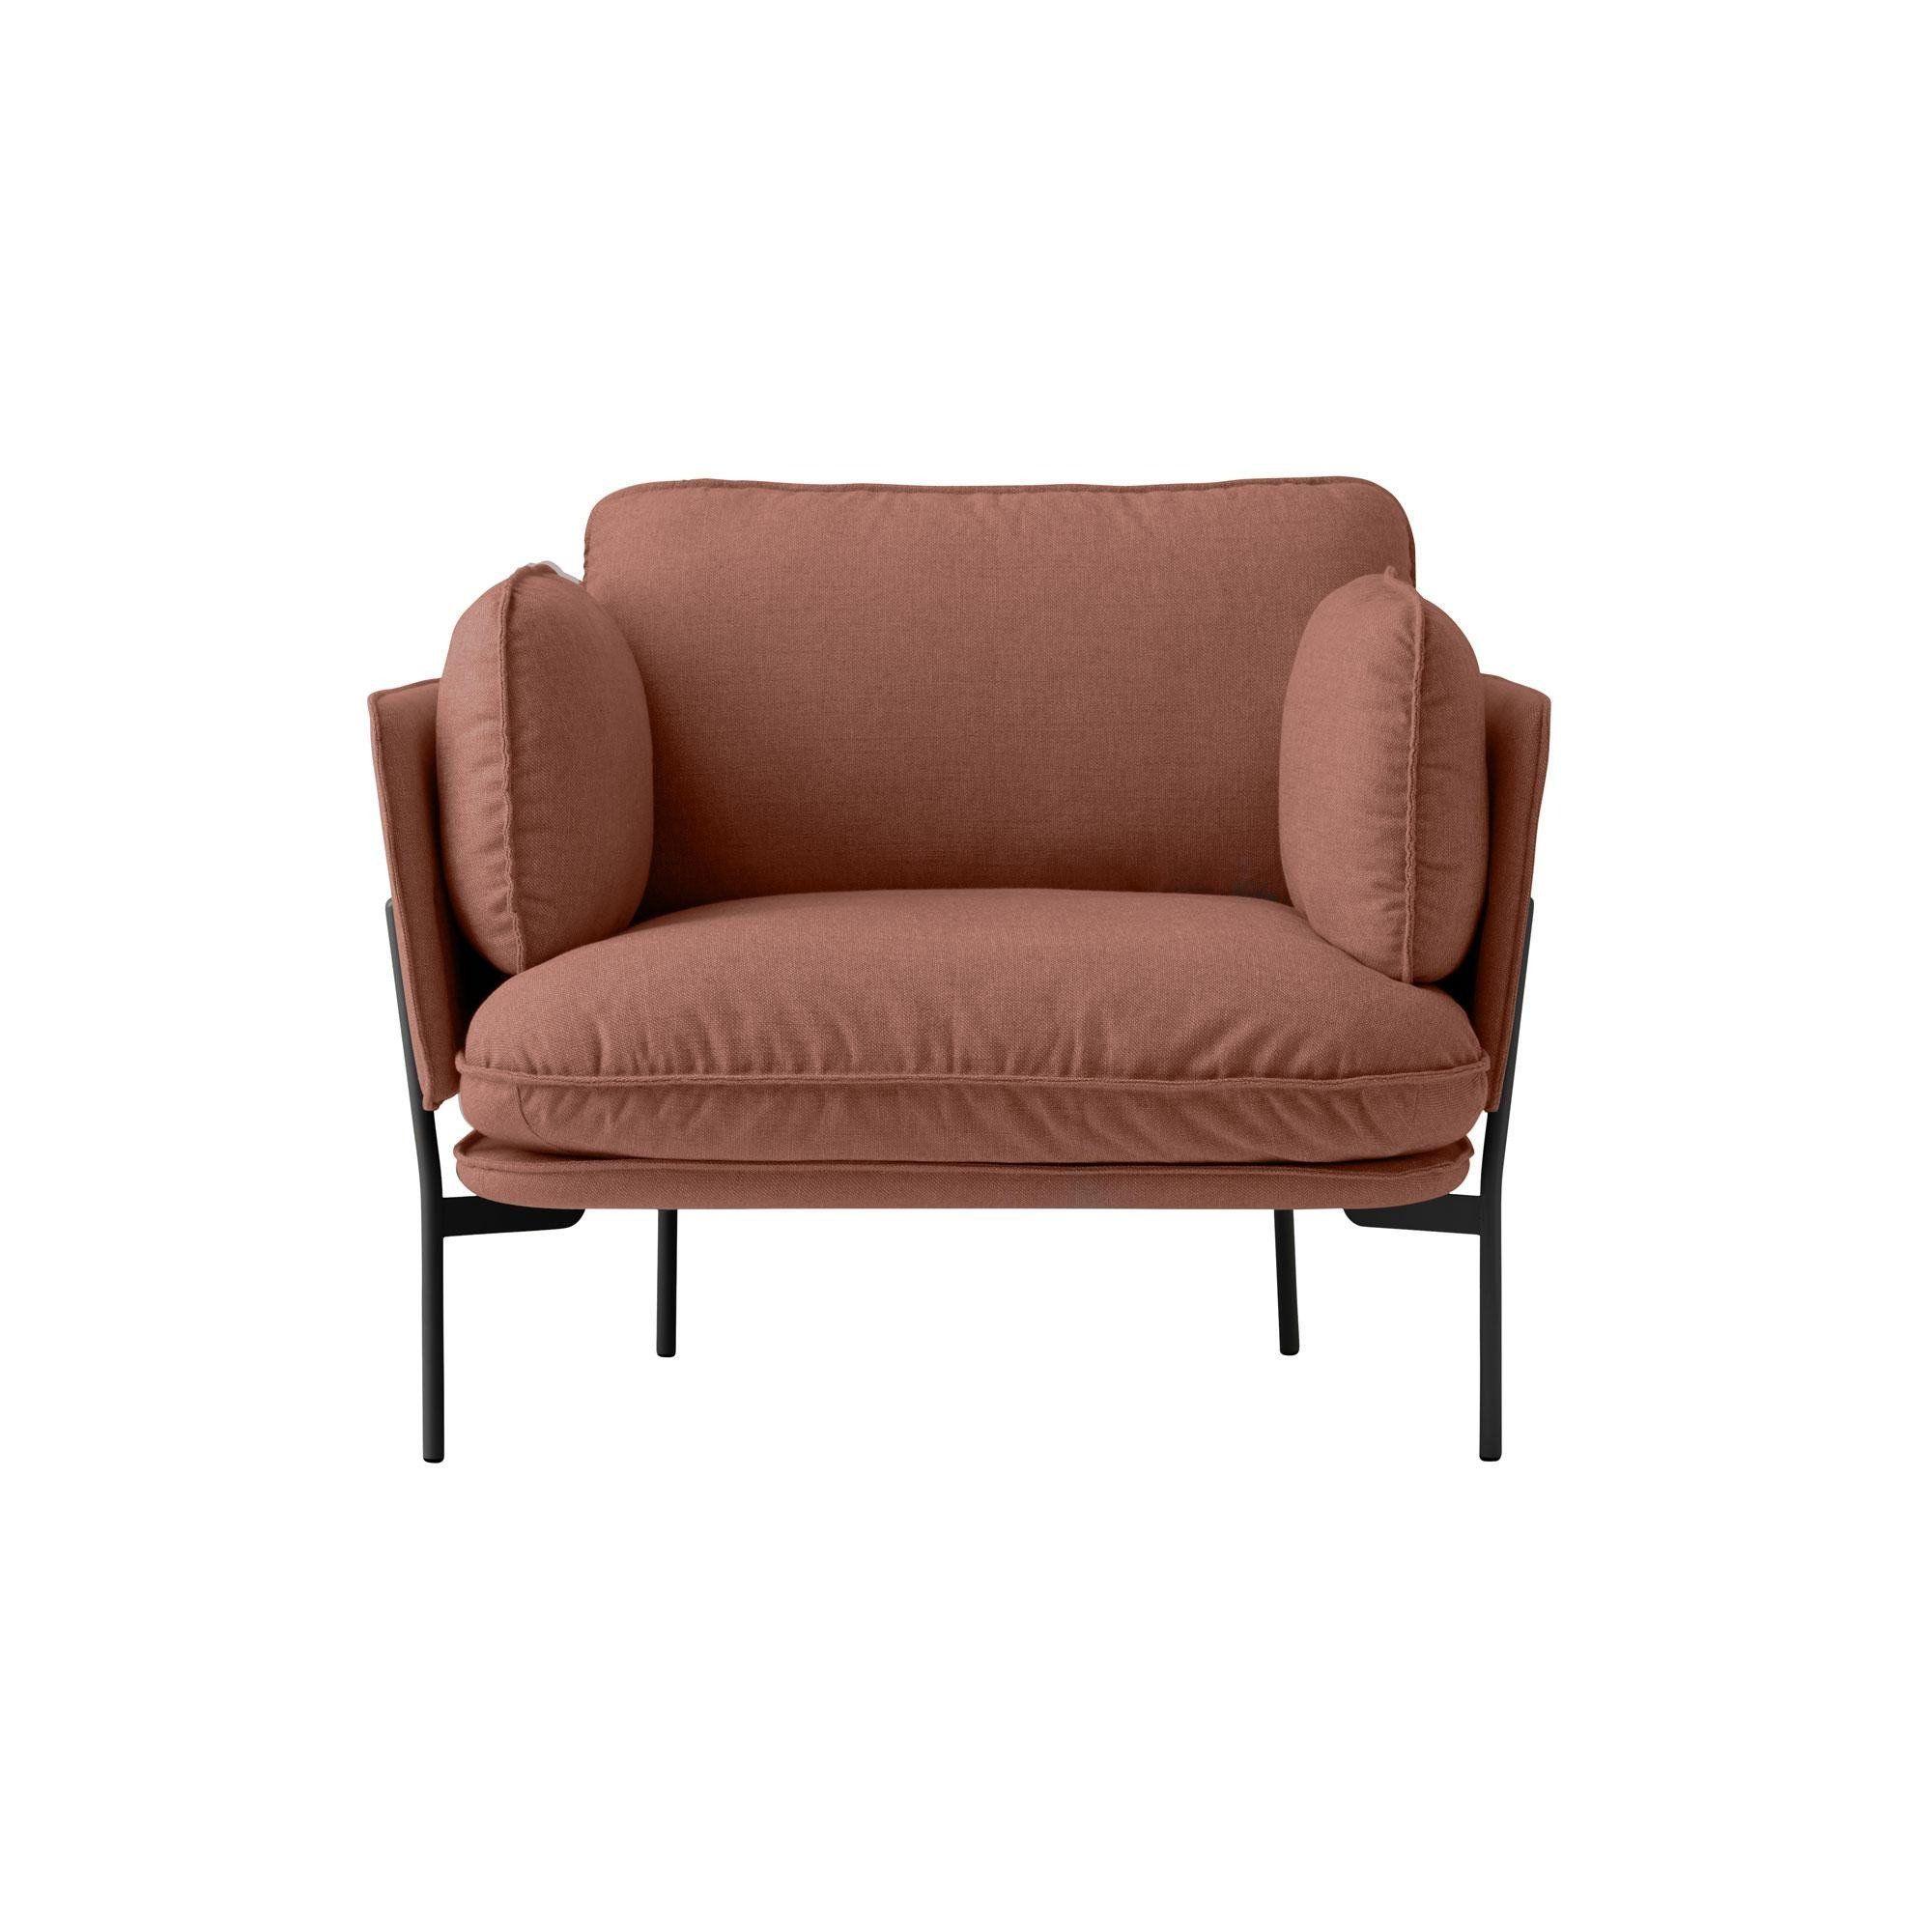 Lounge sessel braun stoff  &tradition Cloud LN1 Sessel | AmbienteDirect